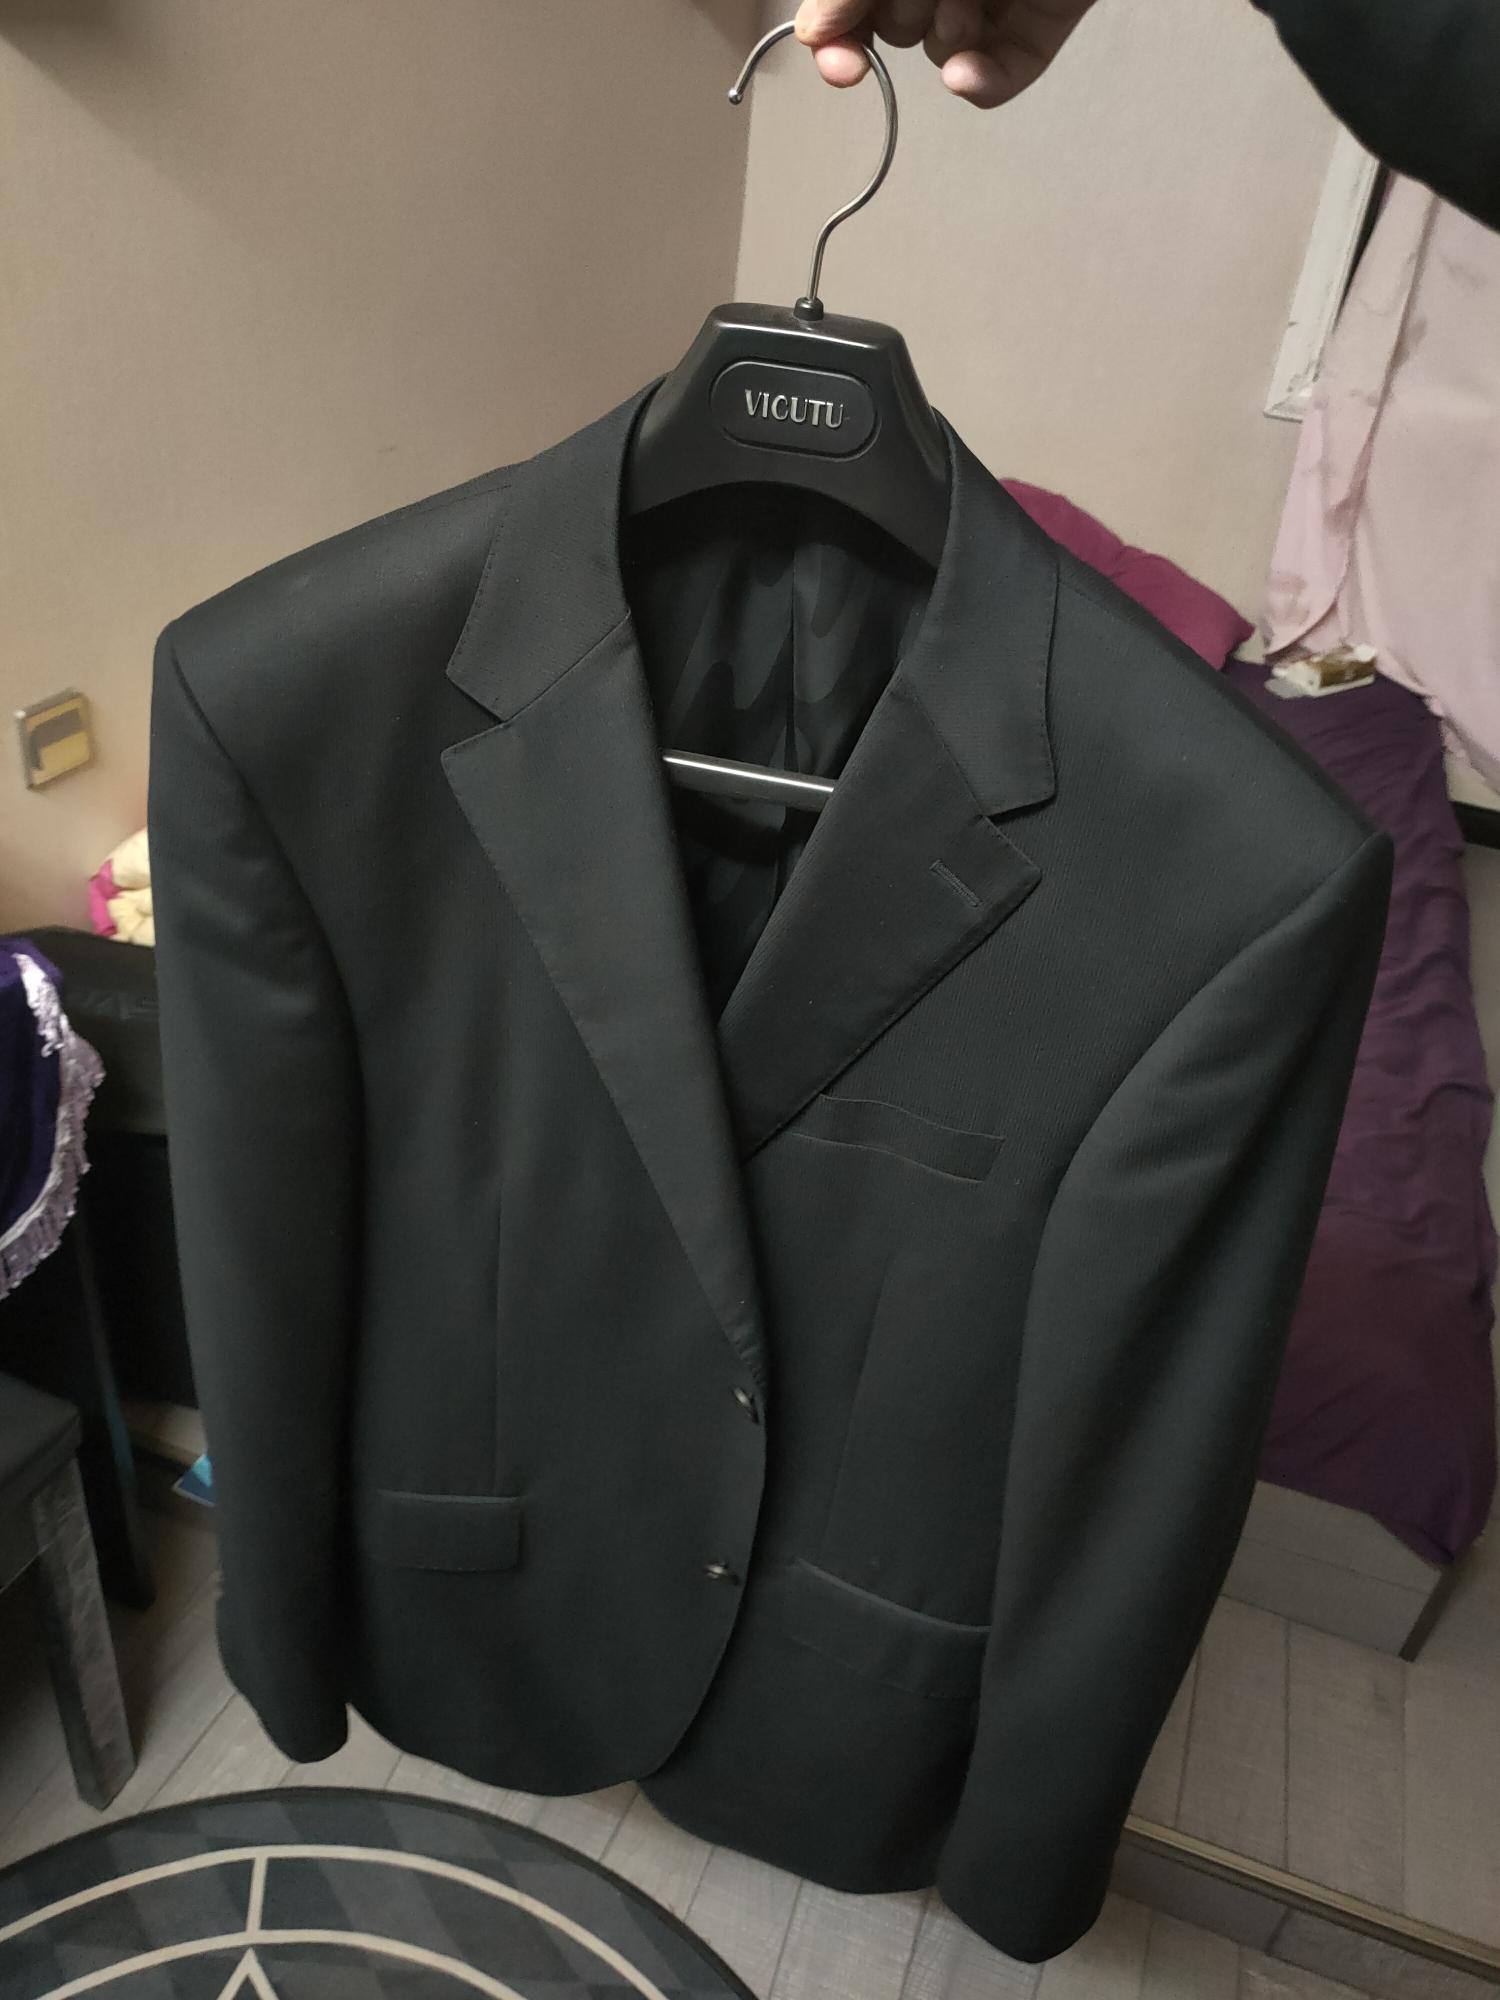 VICUTU  威可多 西装上衣外套(仅外套)商场买的。成色